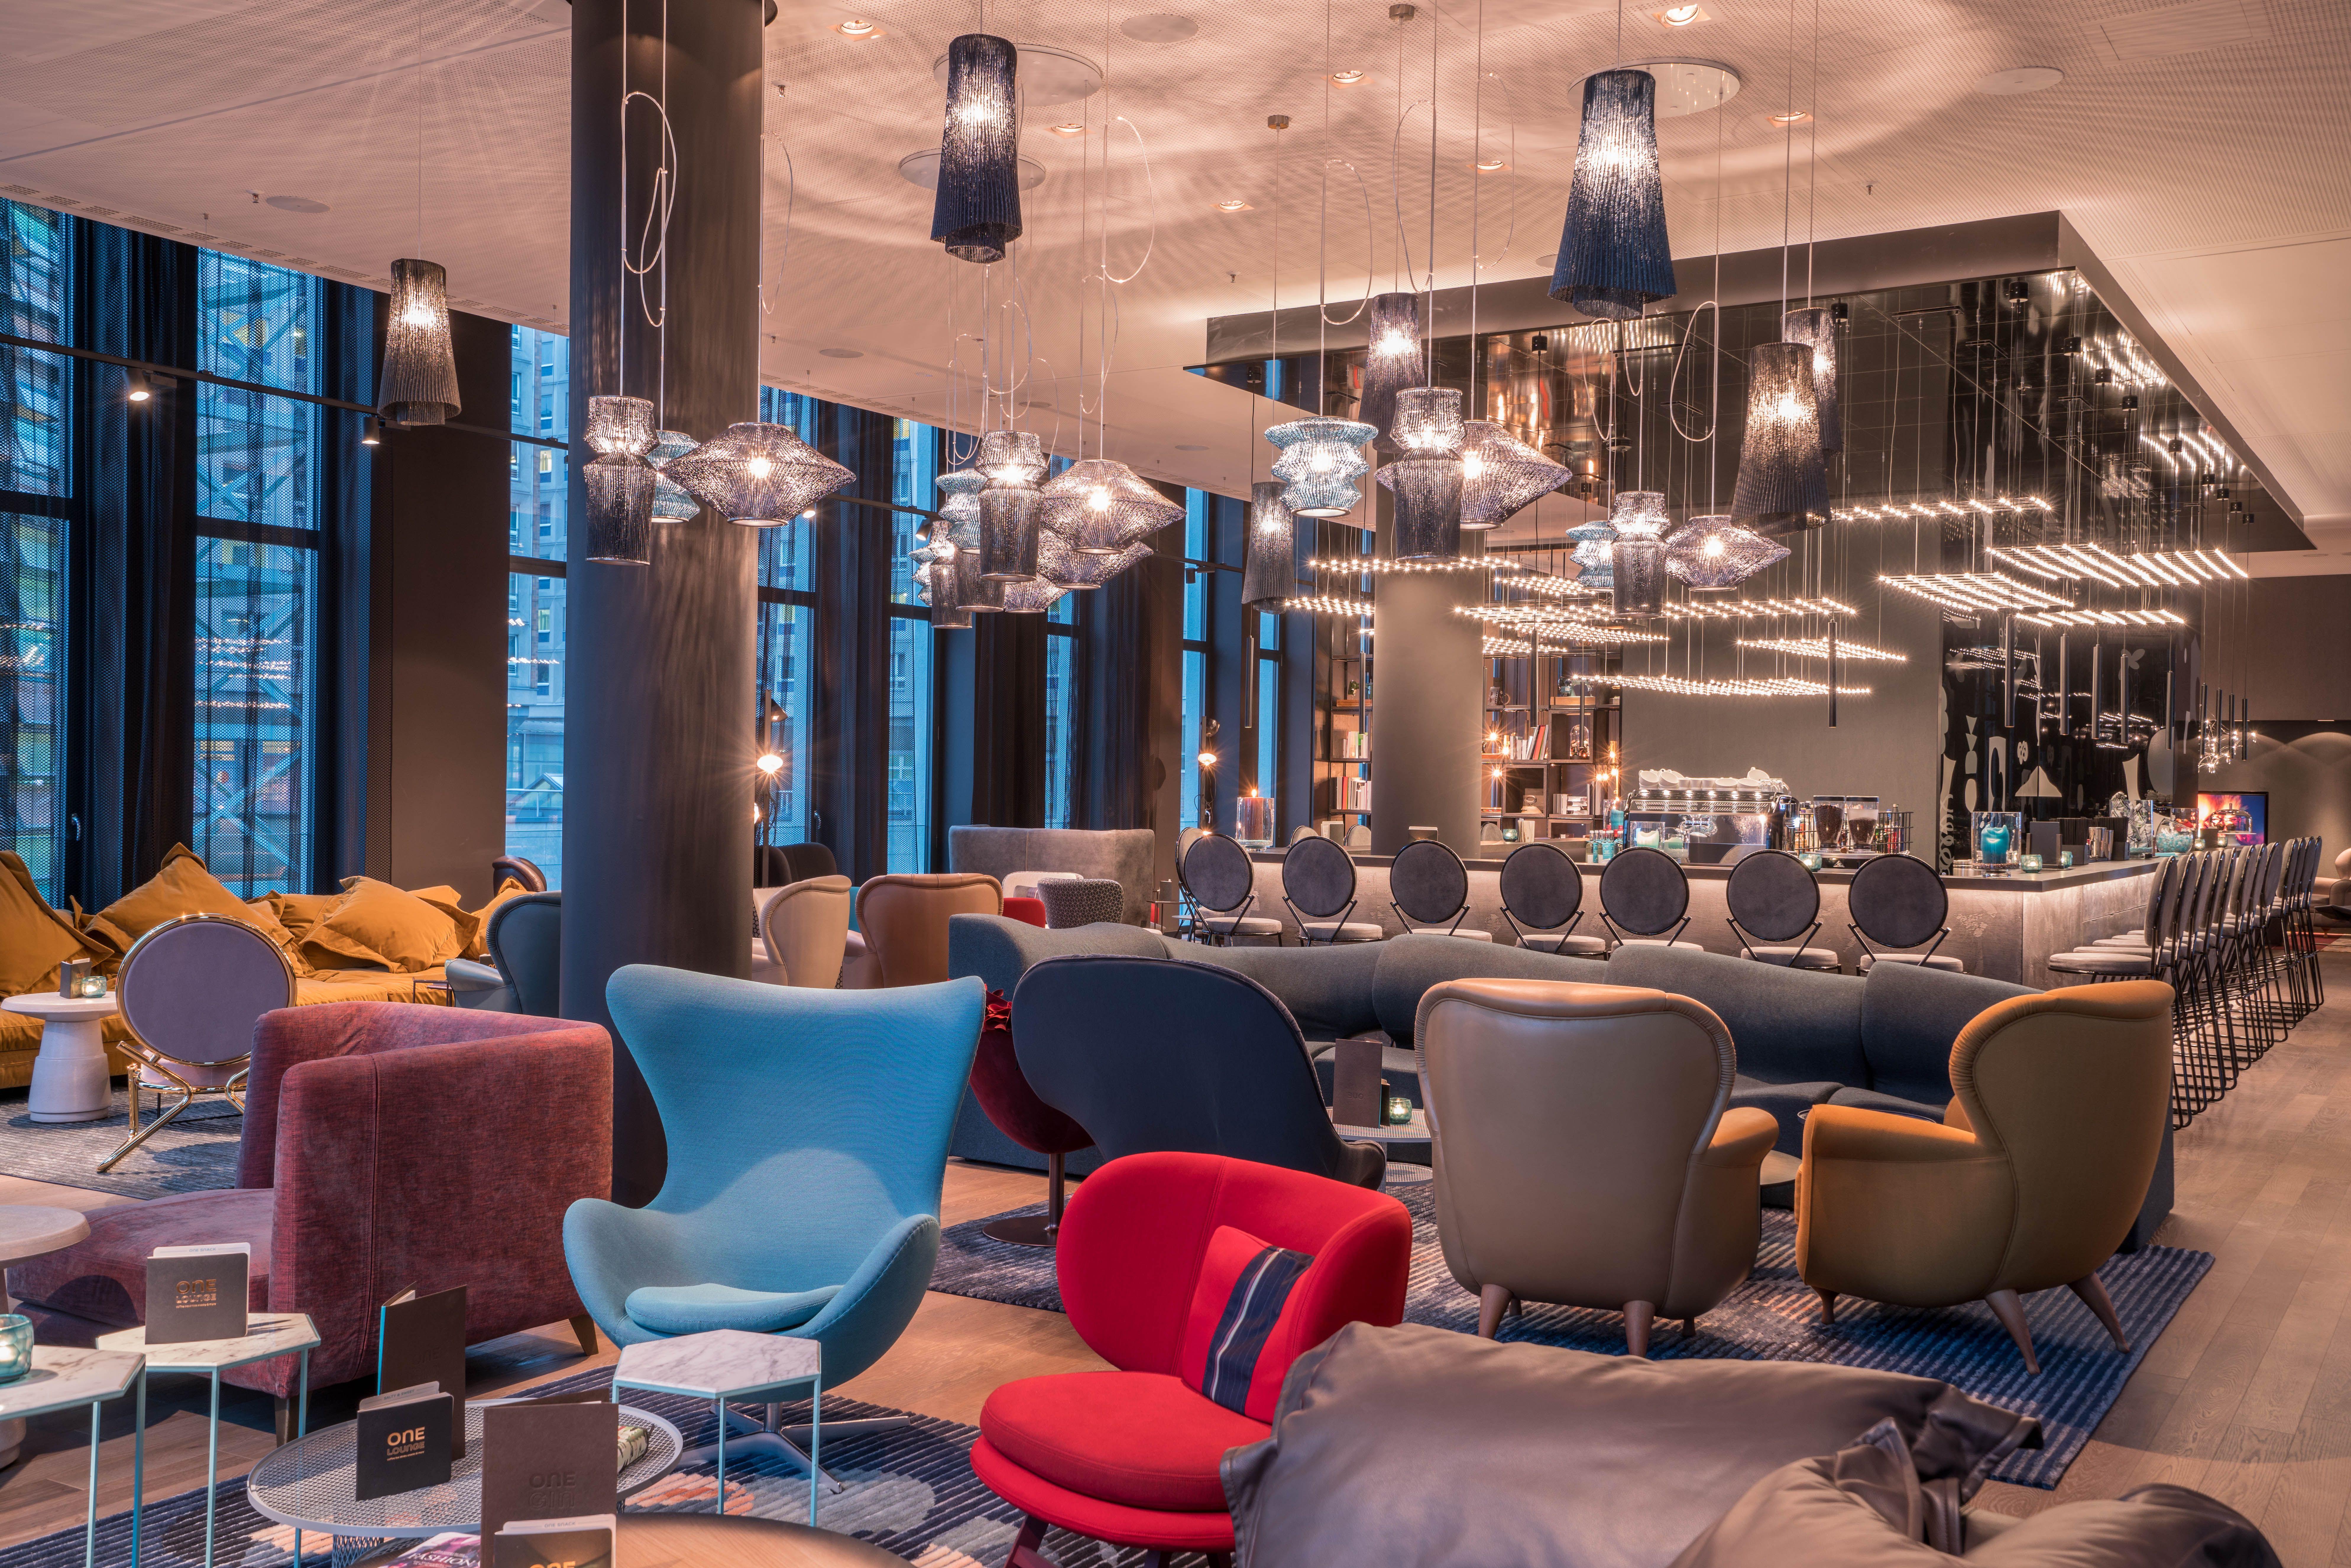 Hotel Berlin Alexanderplatz Motel One Design Hotels Berlin Alexanderplatz Hotel Berlin Design Hotel Design